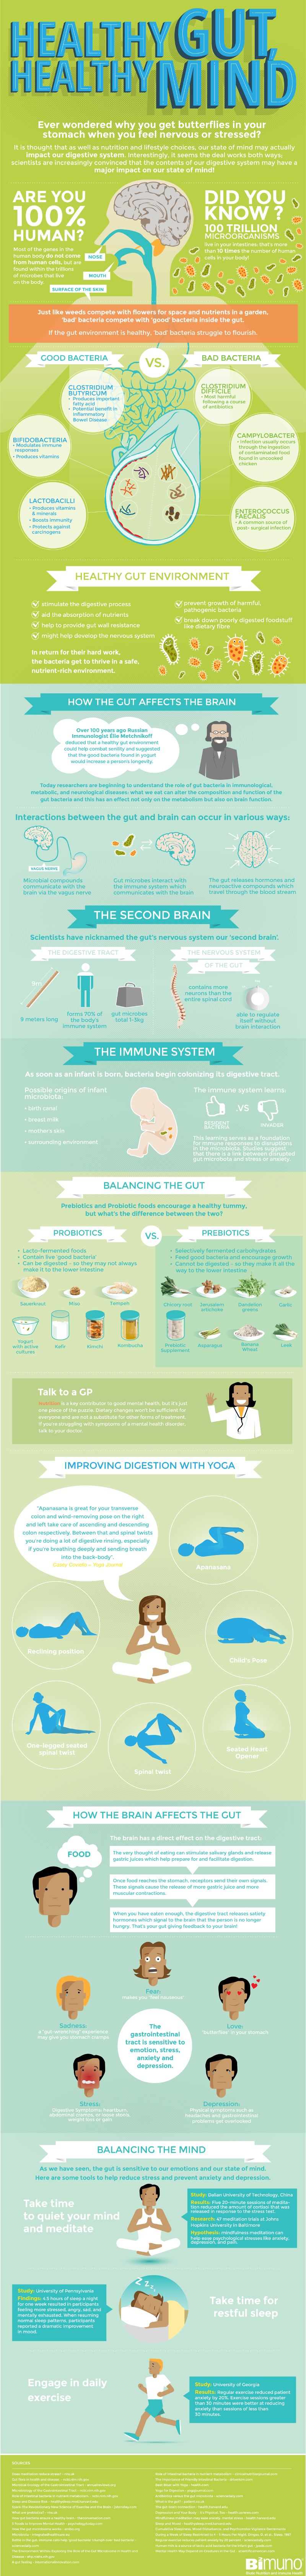 gut bacteria poster